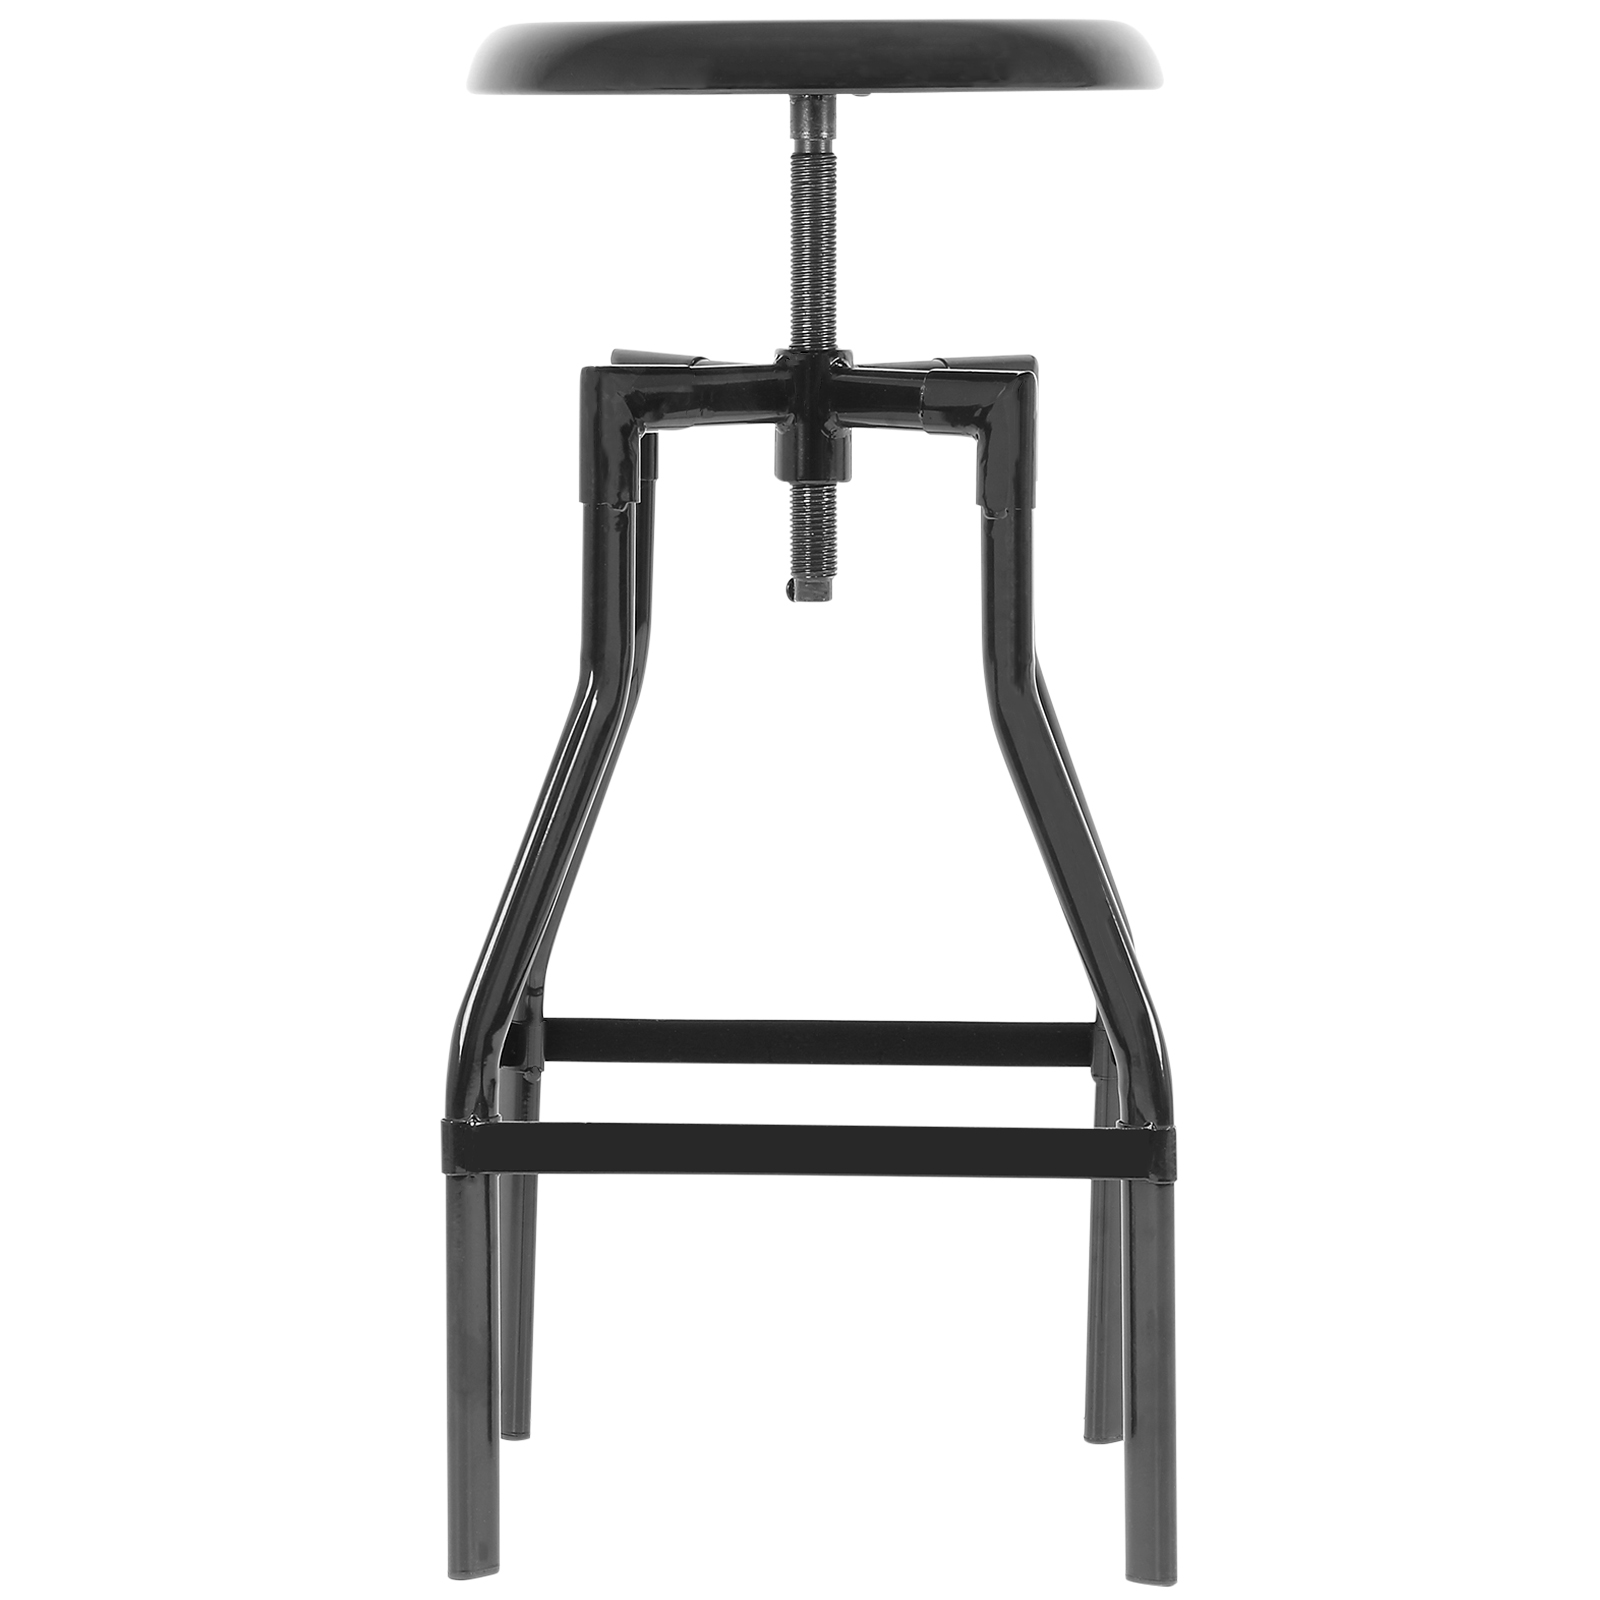 Hartleys tall retro swivel screw bar table stool height adjustable metal seat ebay - Screw top bar stools ...